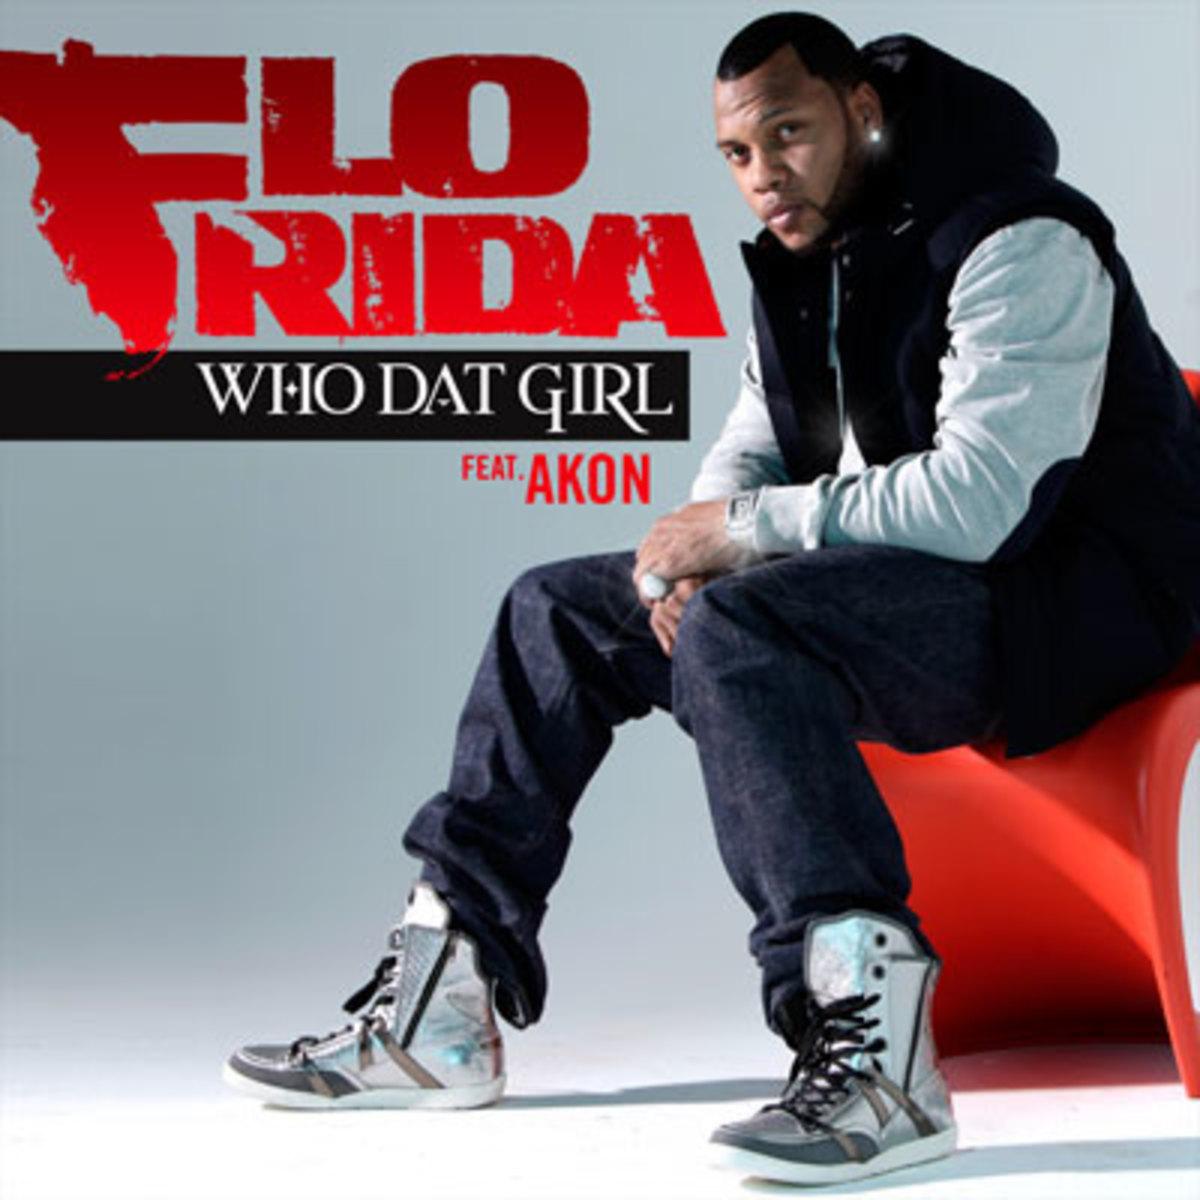 florida-whodatgirl.jpg